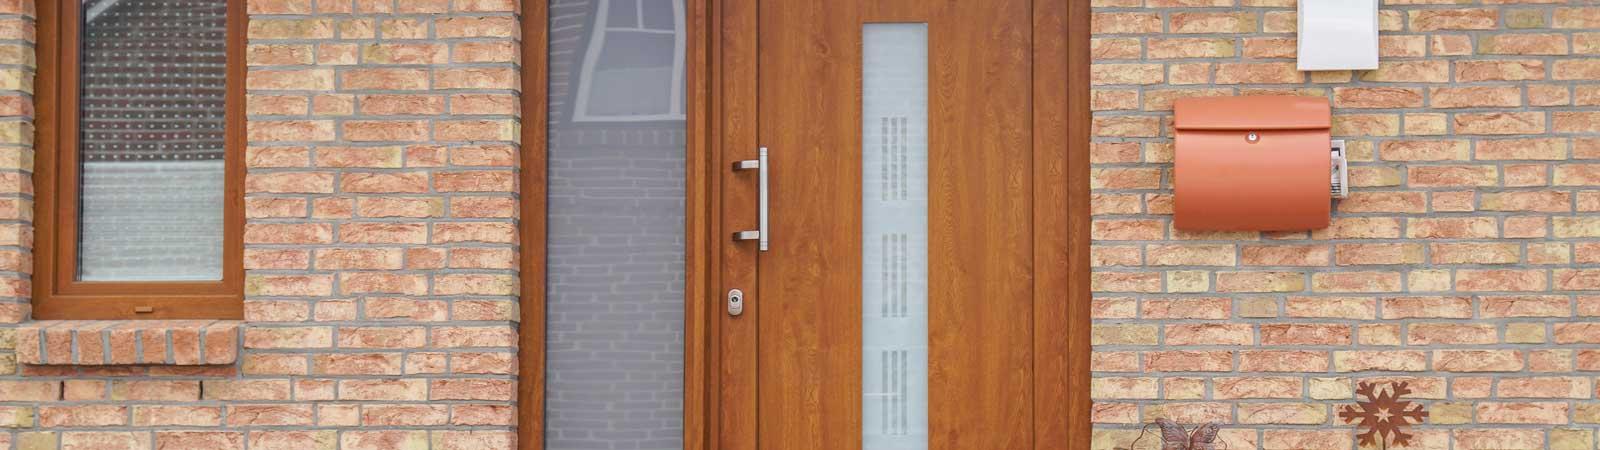 Fabulous Haustür Preise | Fenster und Türen modernisieren BW53